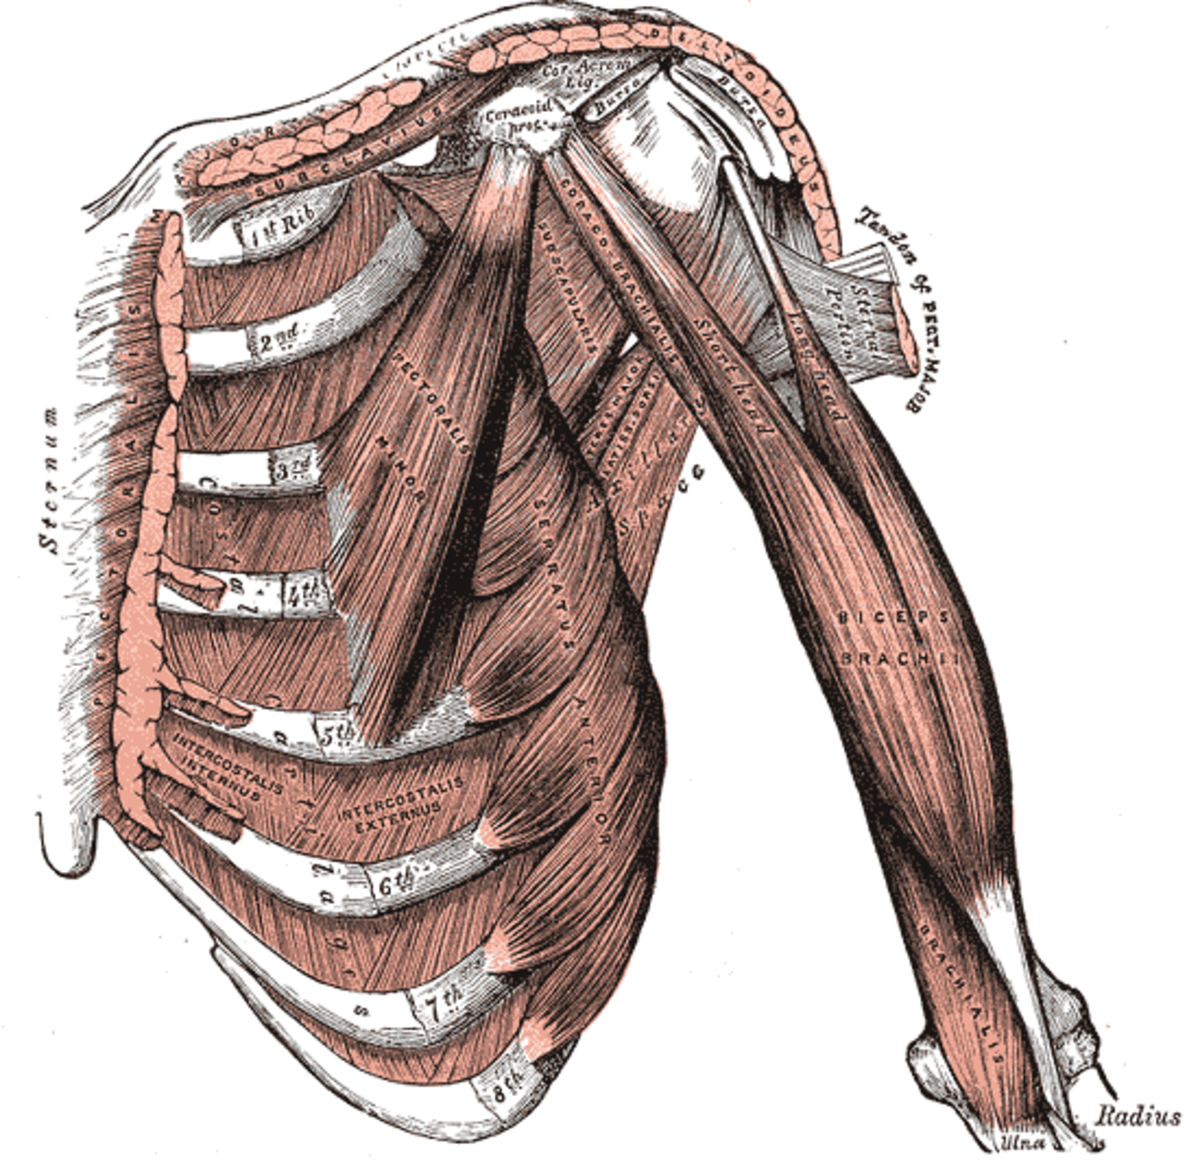 Intercostal muscles go from rib to rib.